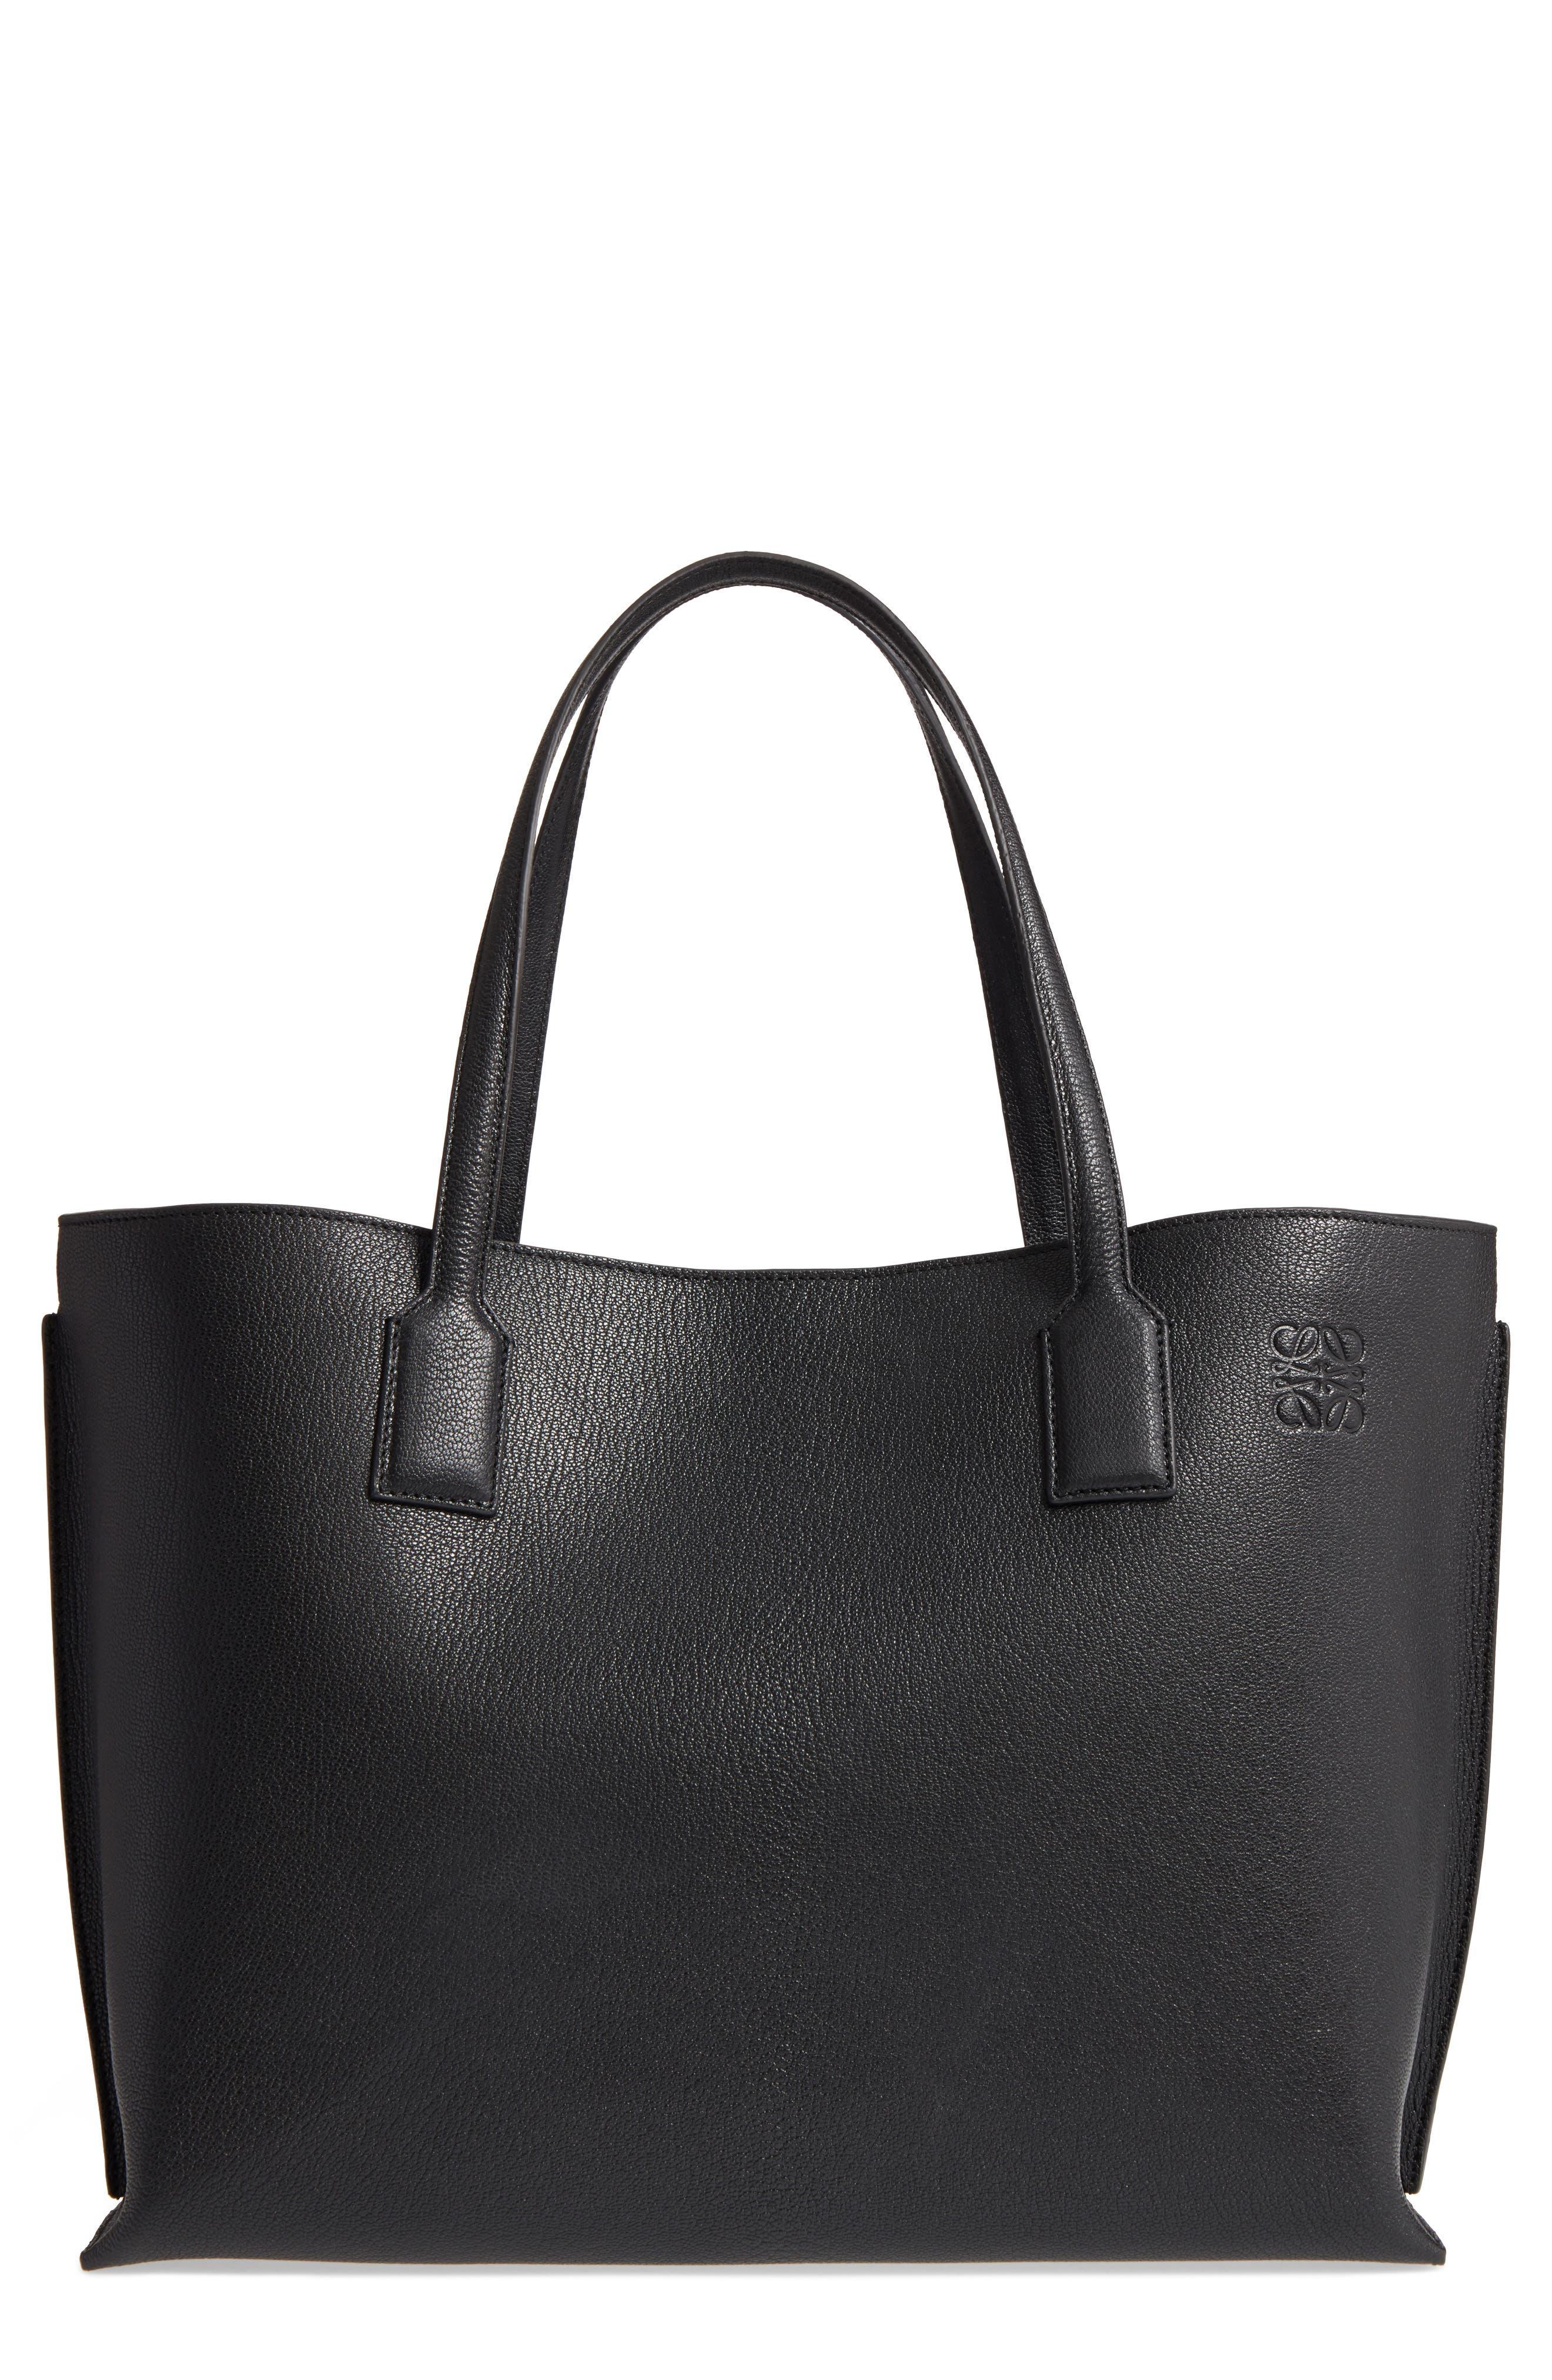 Loewe Large Leather T-Shopper